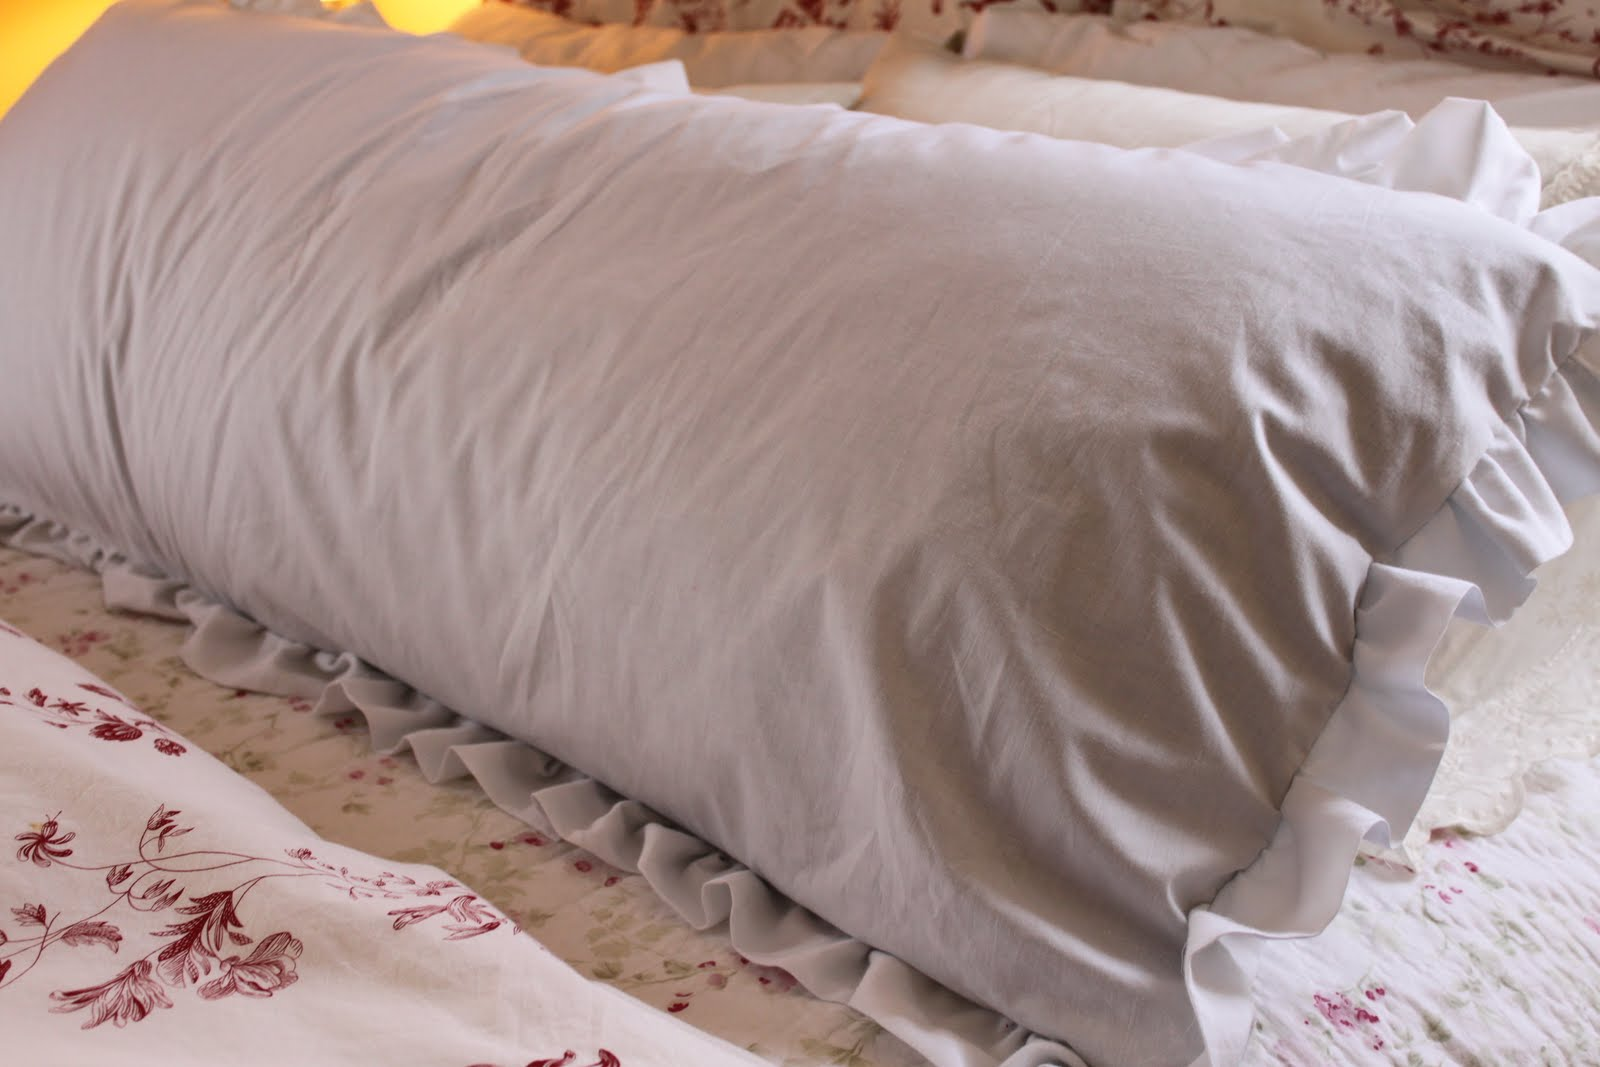 do it yourself divas: DIY: Body Pillow Cover